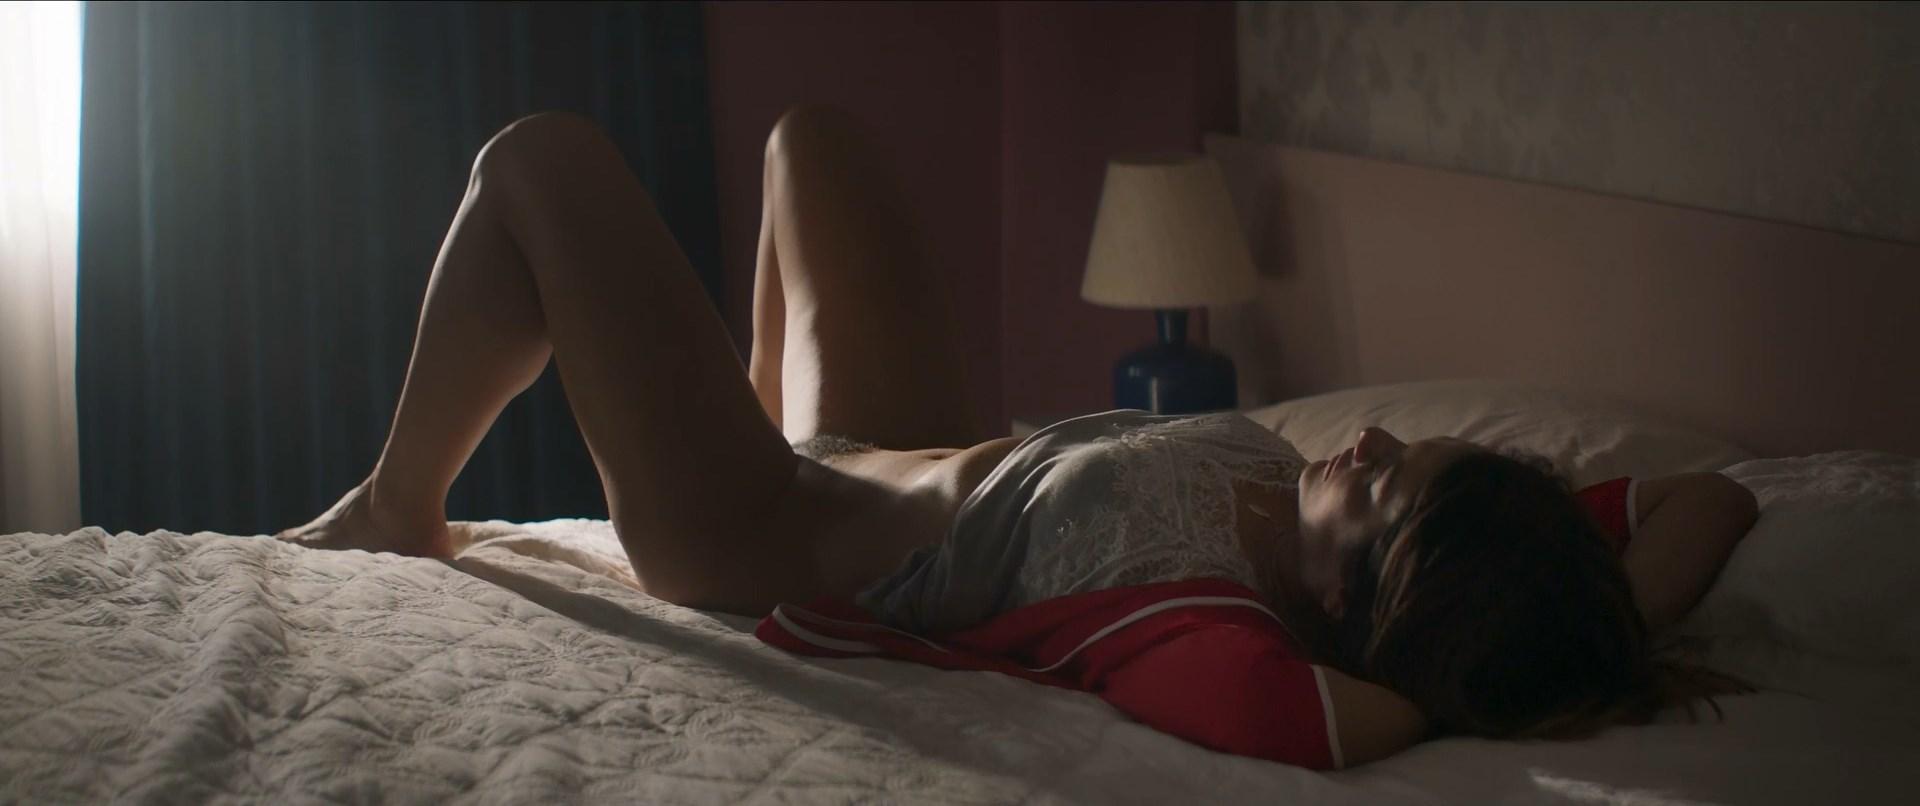 Andréa Horta Nua watch online - dira paes, etc - divino amor (2019) hd 1080p.